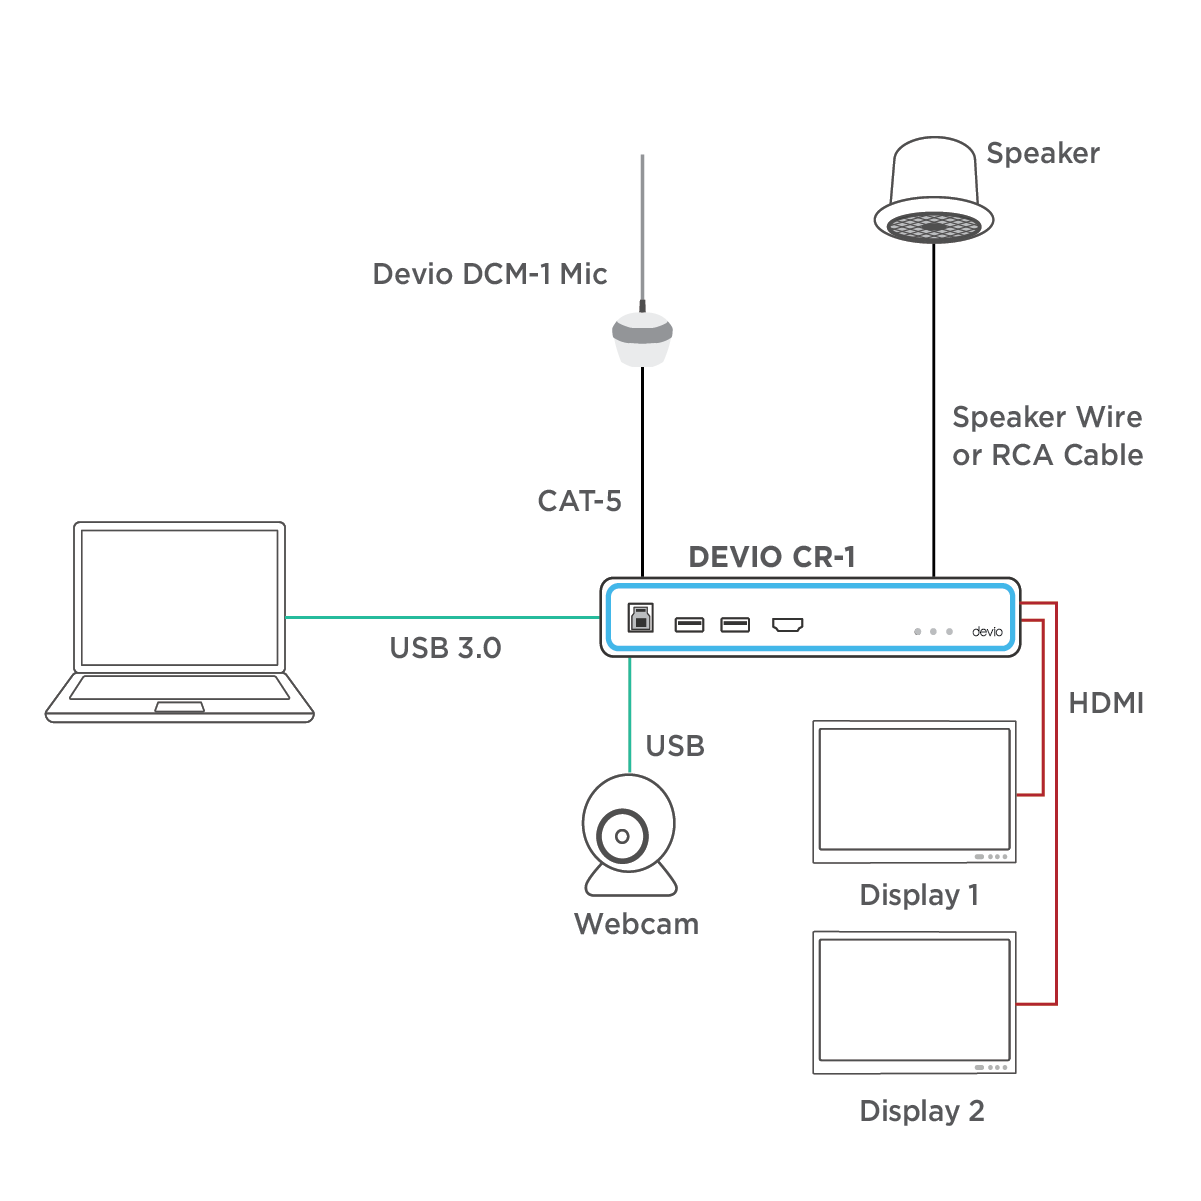 bogen speaker wiring diagram wiring diagrams best bogen 70v speaker wiring diagram wiring diagram online bogen communications speaker wiring diagrams bogen 70v speaker